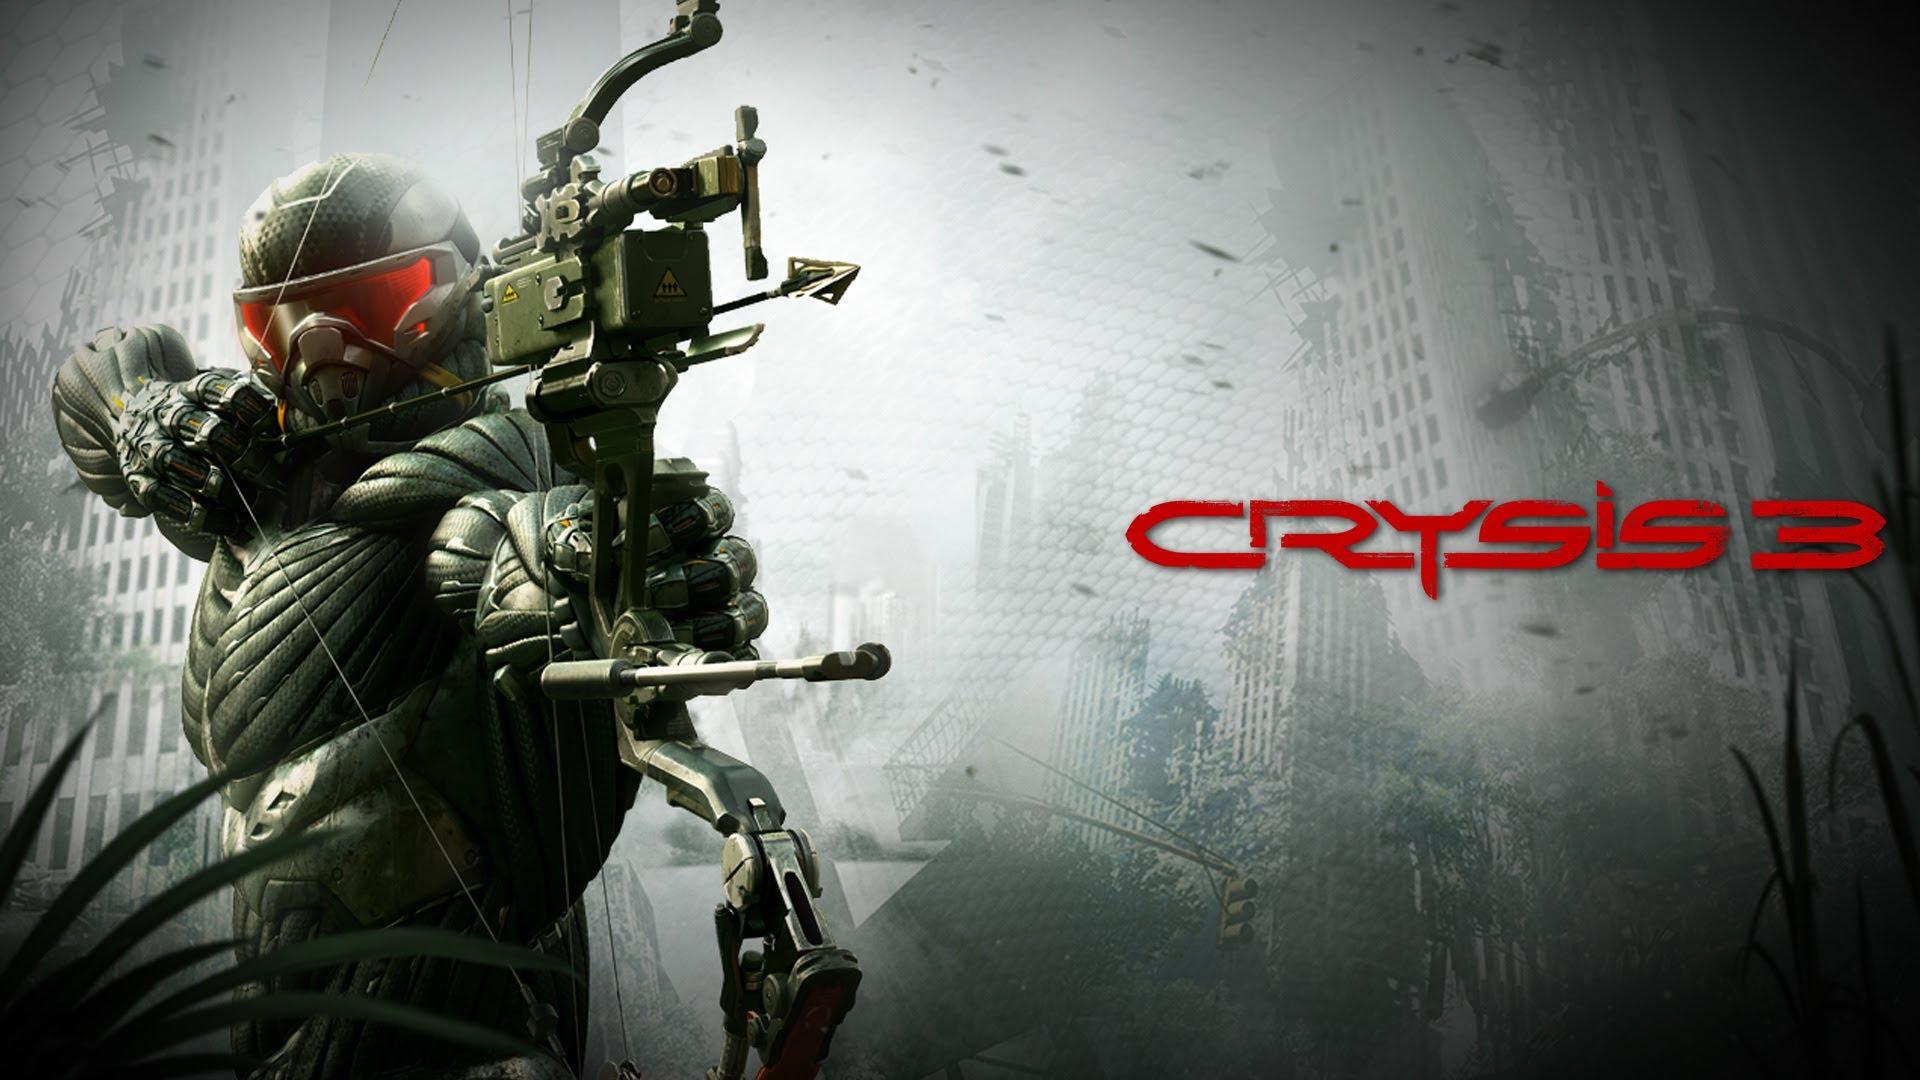 crysis-3-download-xgamex